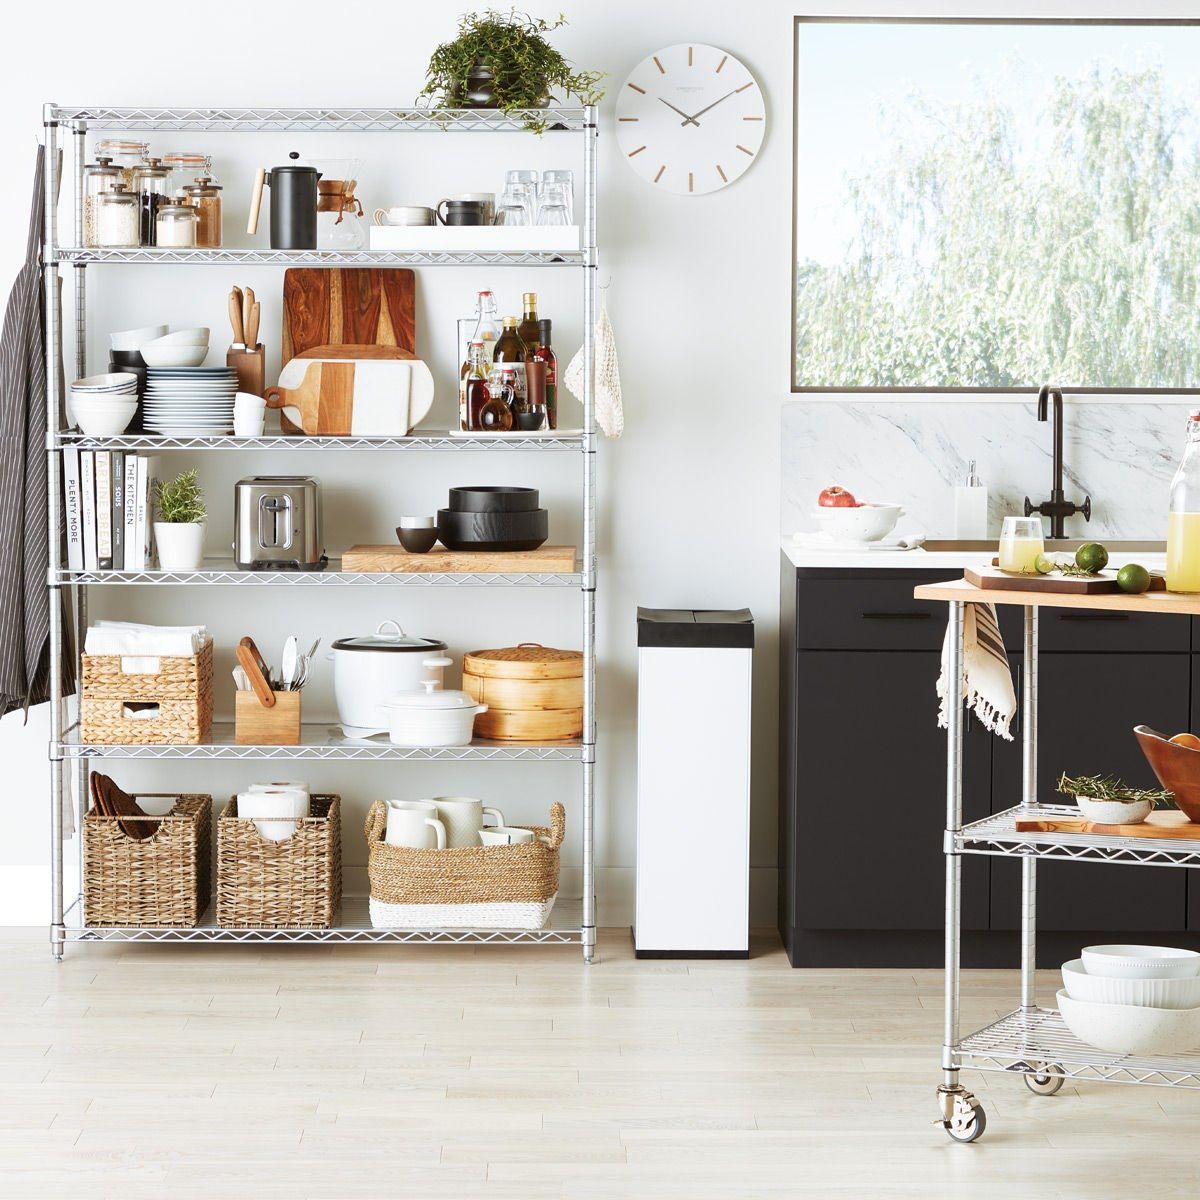 Our Metro Commercial Shelving Is The Original Chrome Plated Steel Shelving Used Professionally In Restaurant Shelving Open Kitchen Shelves Restaurant Shelving